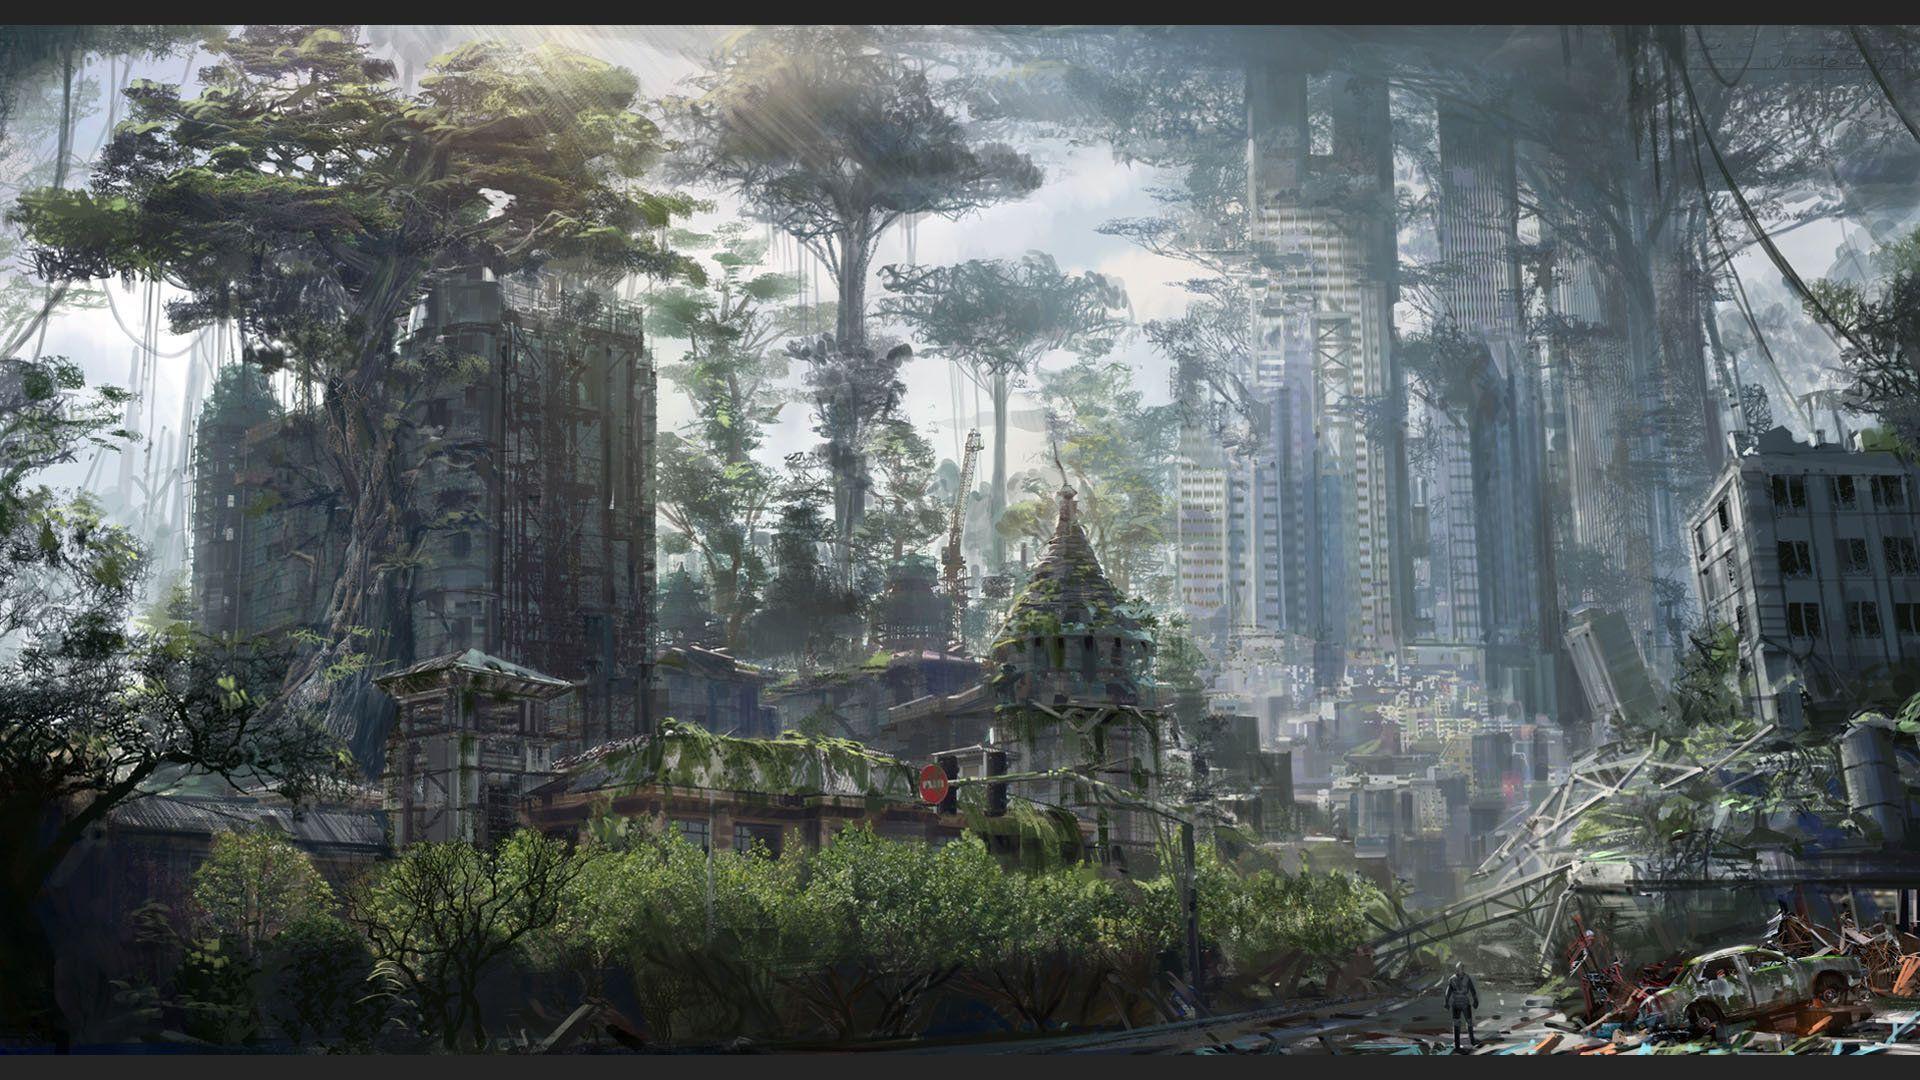 artstation - aftermath, concept 4 | desolate locations | pinterest